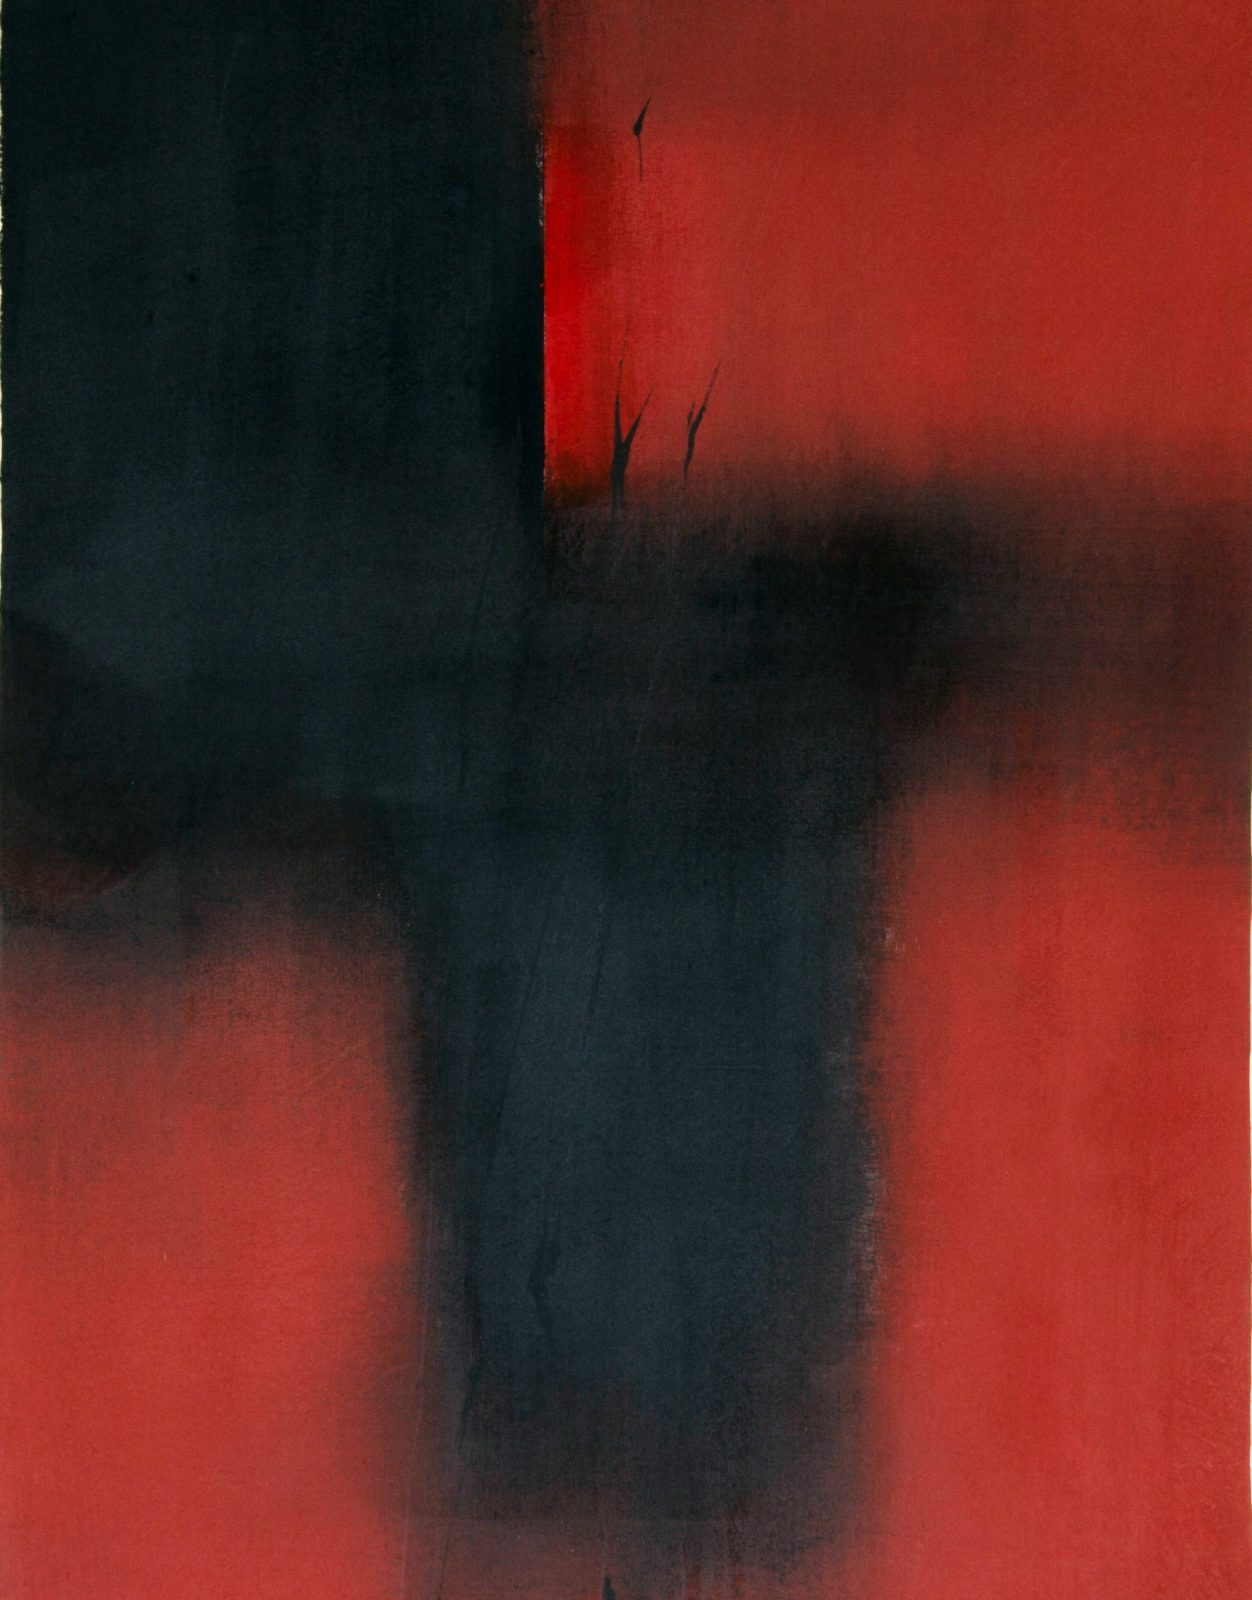 NÖ Waldviertel Galerie Kunst - Holger Musiol